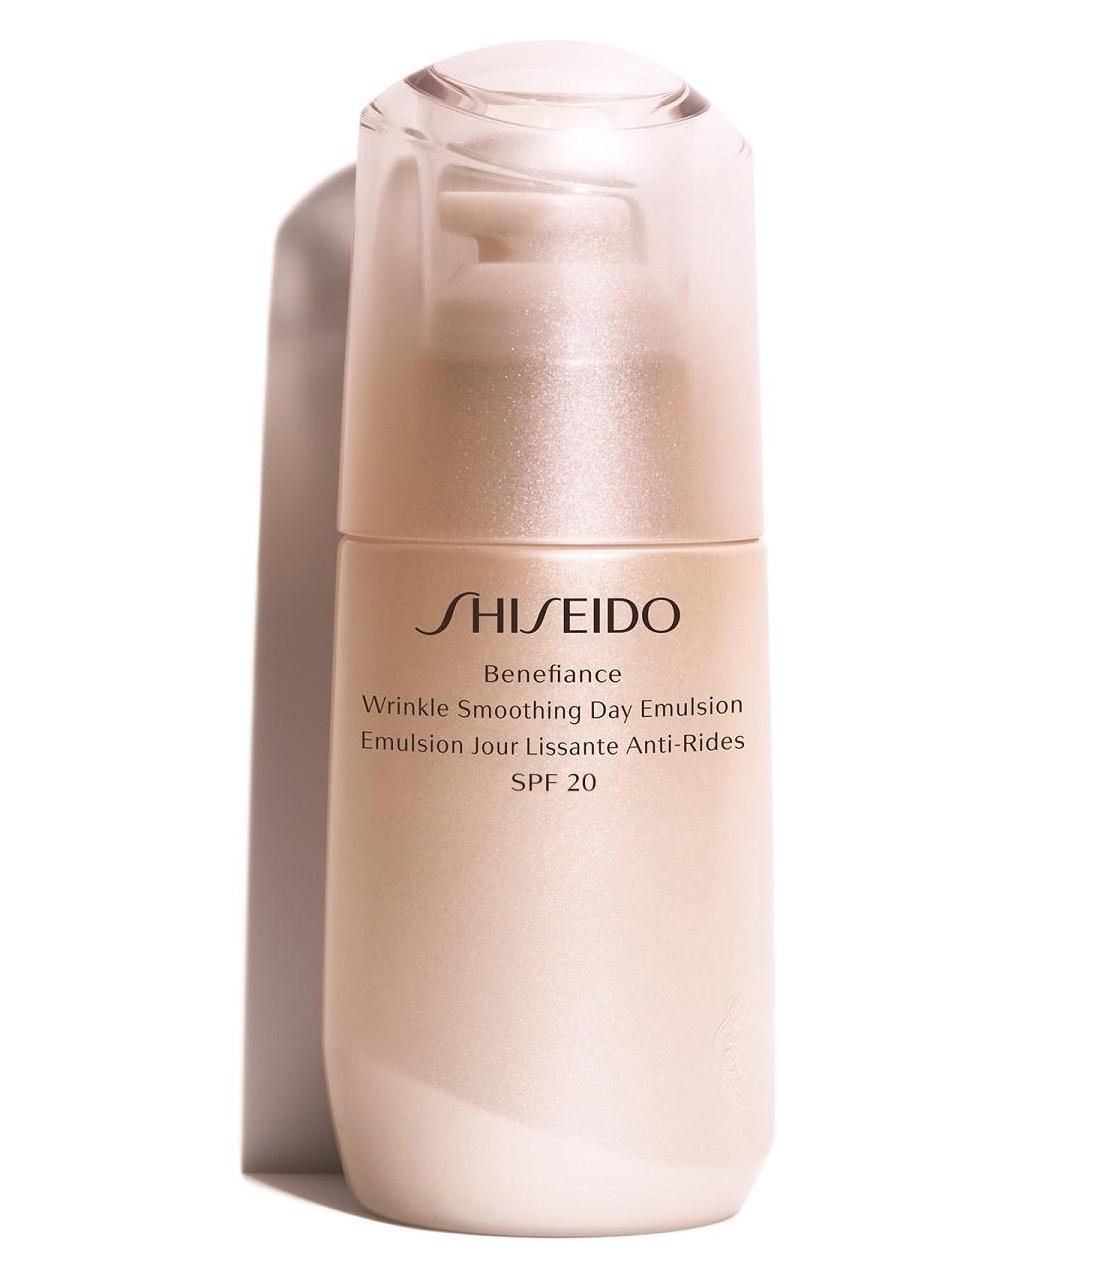 Shiseido Benefiance Wrinkle Smoothing Day Emulsion SPF20  75 ml